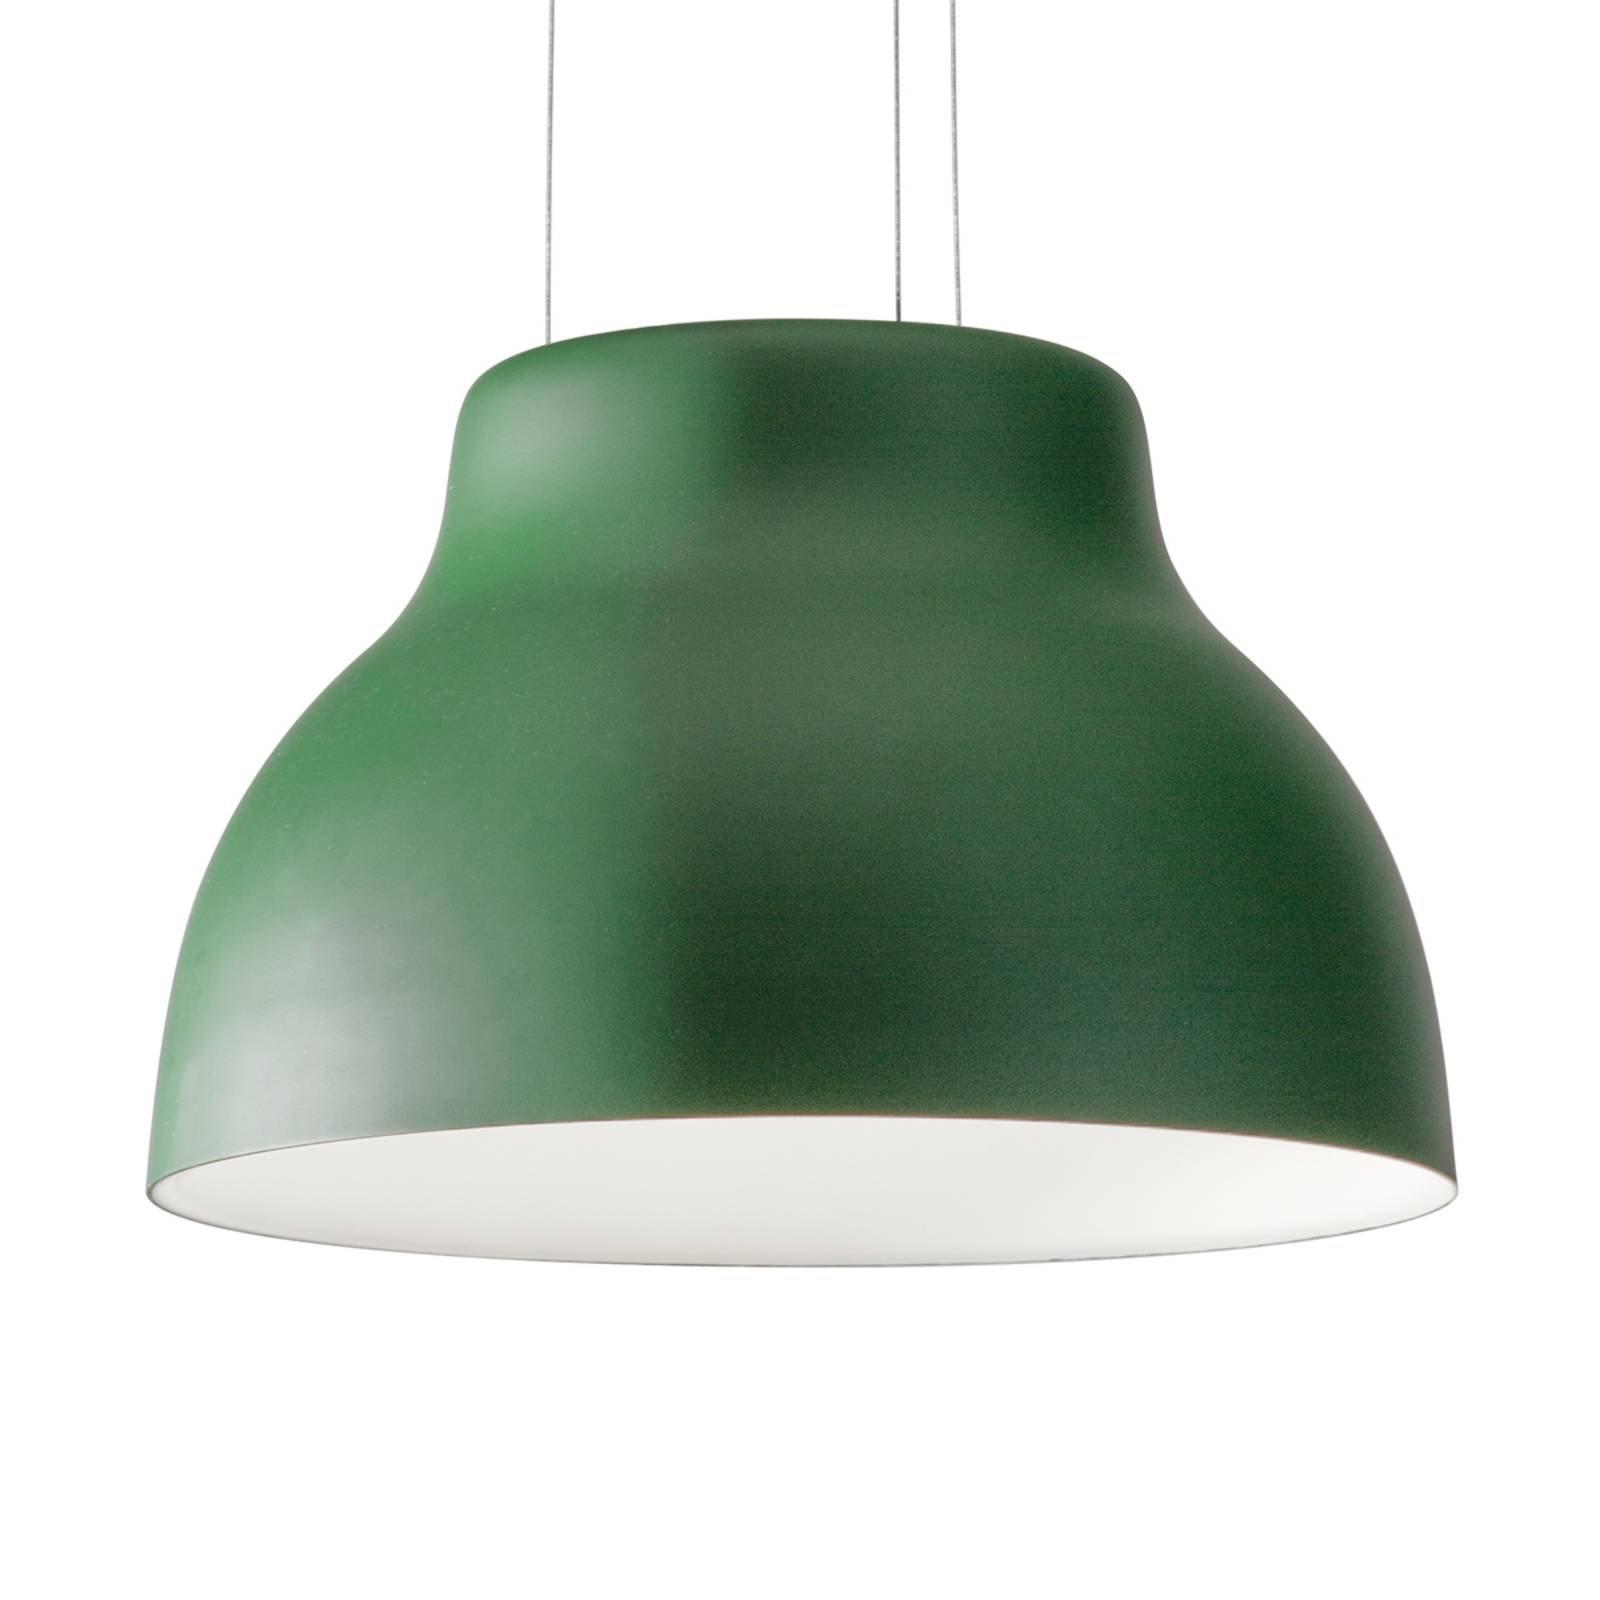 Martinelli Luce Cicala - LED-pendellampe, grønn